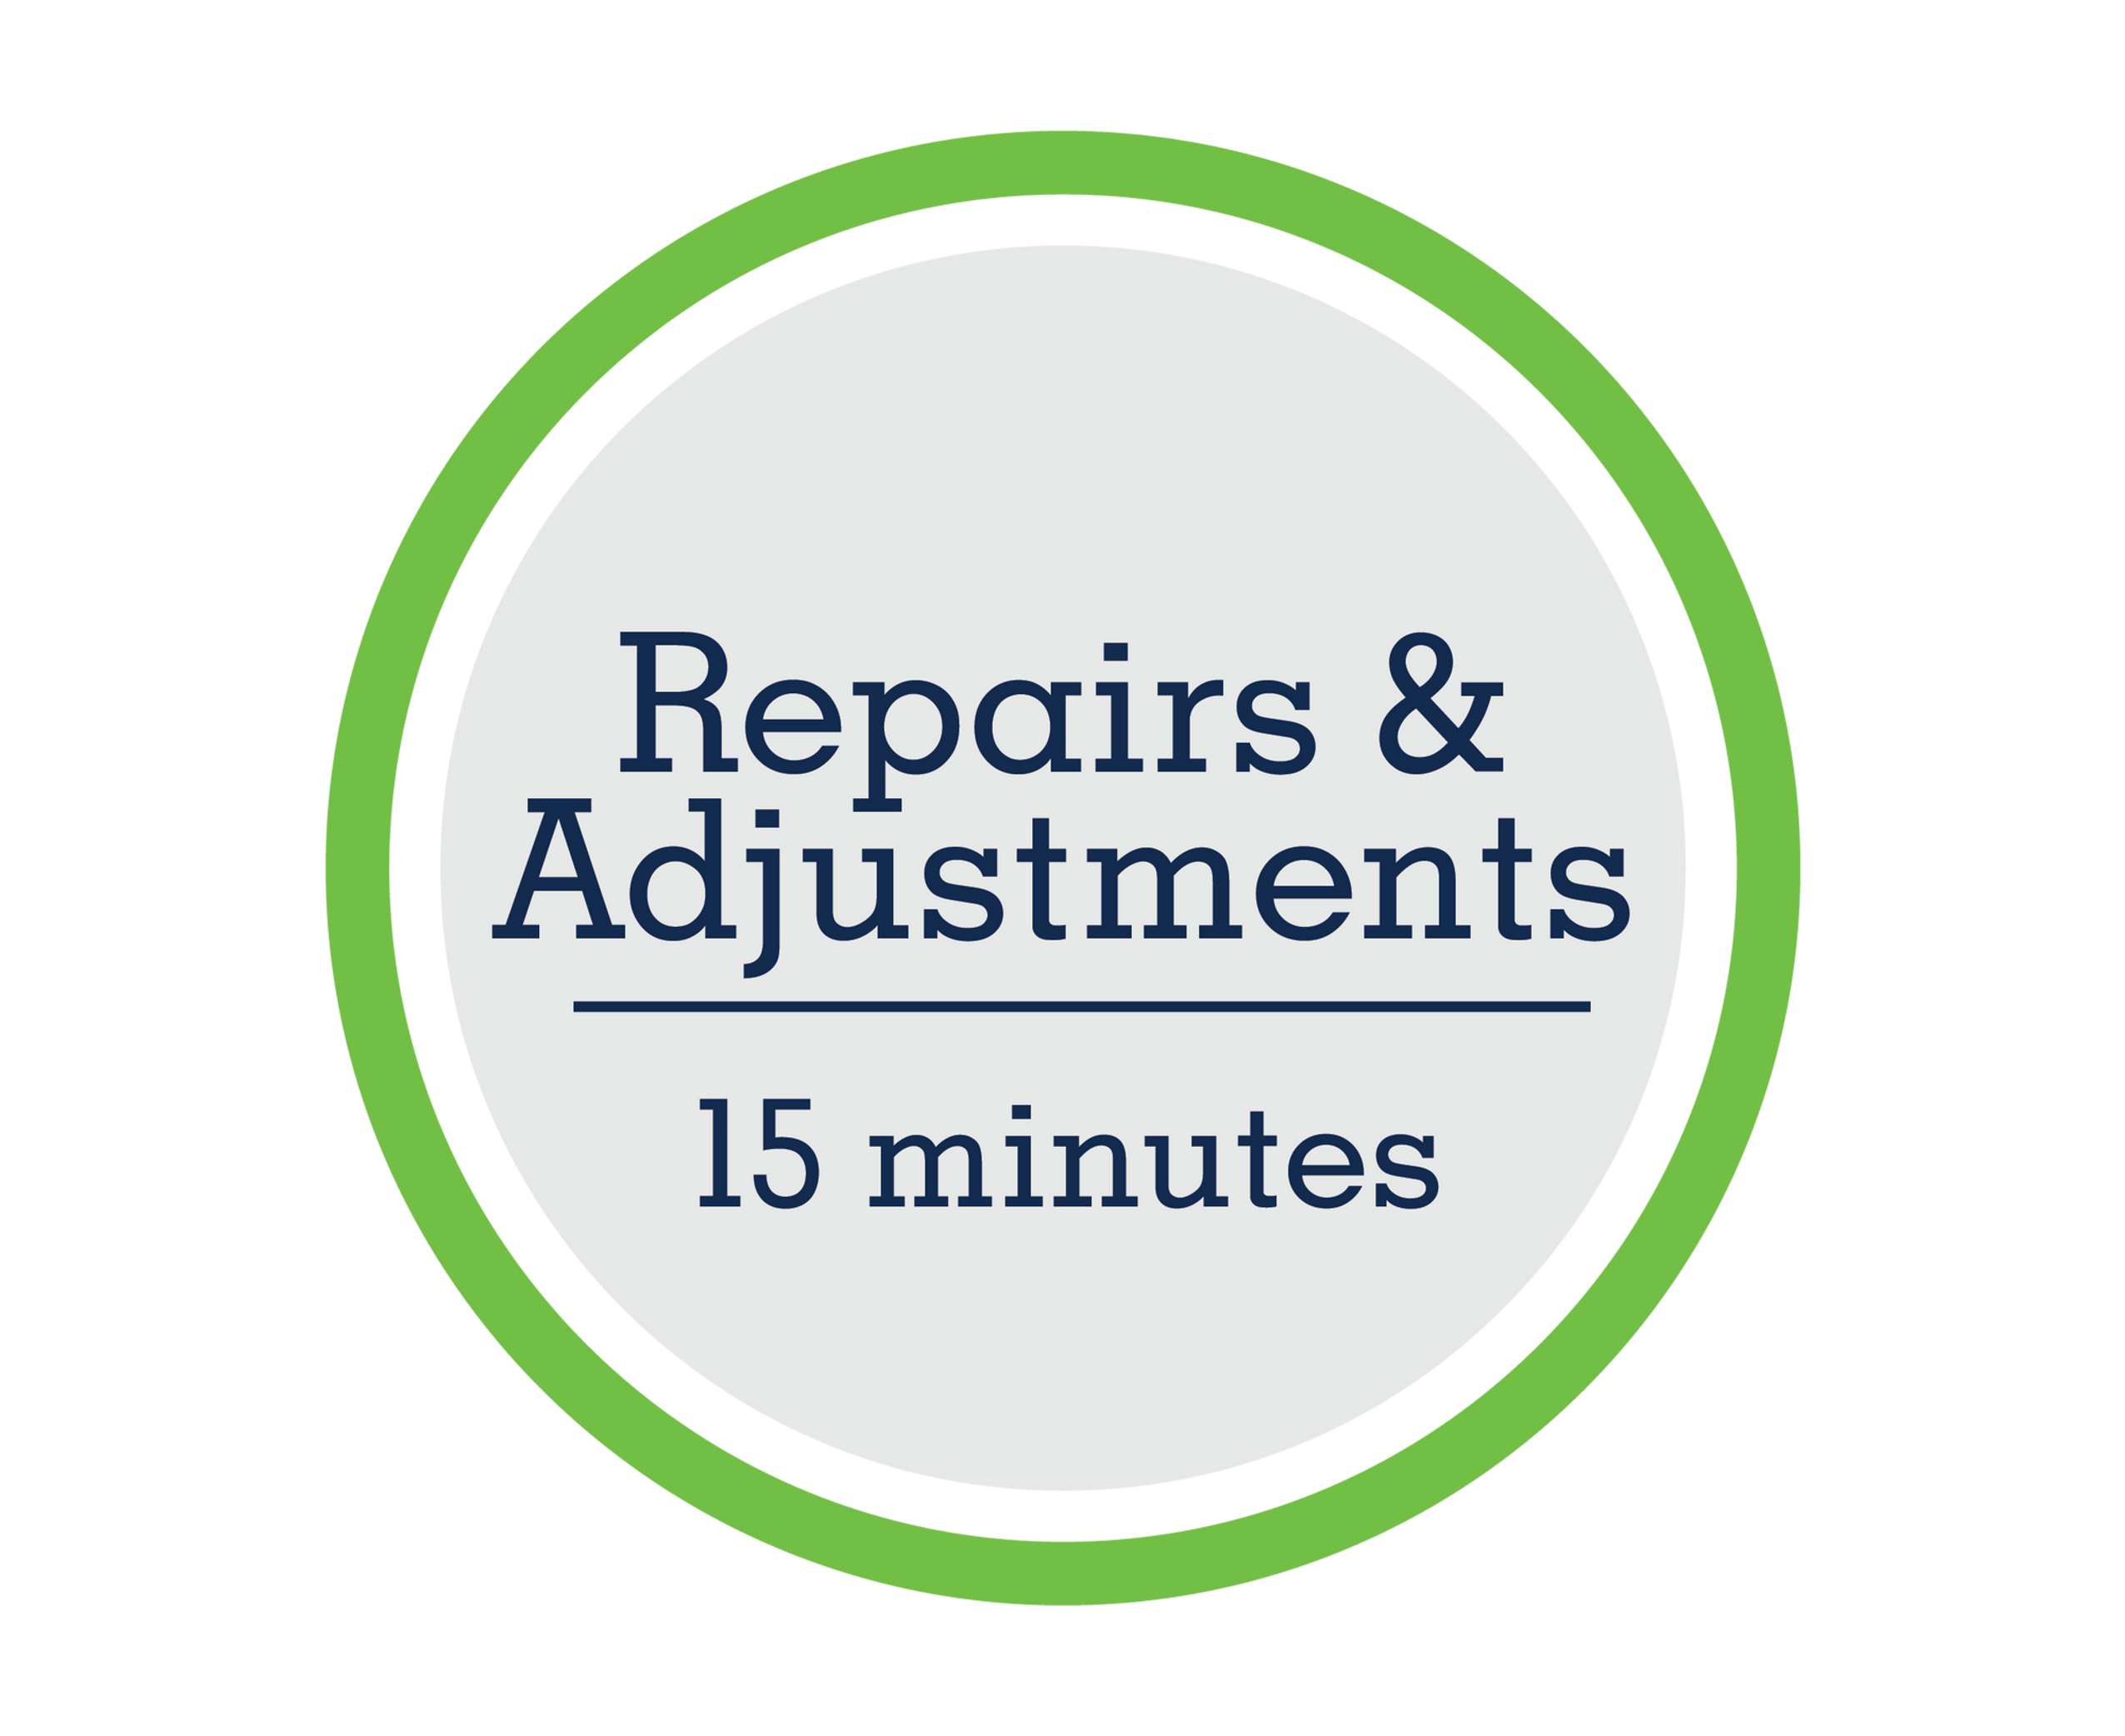 Repairs & Adjustments